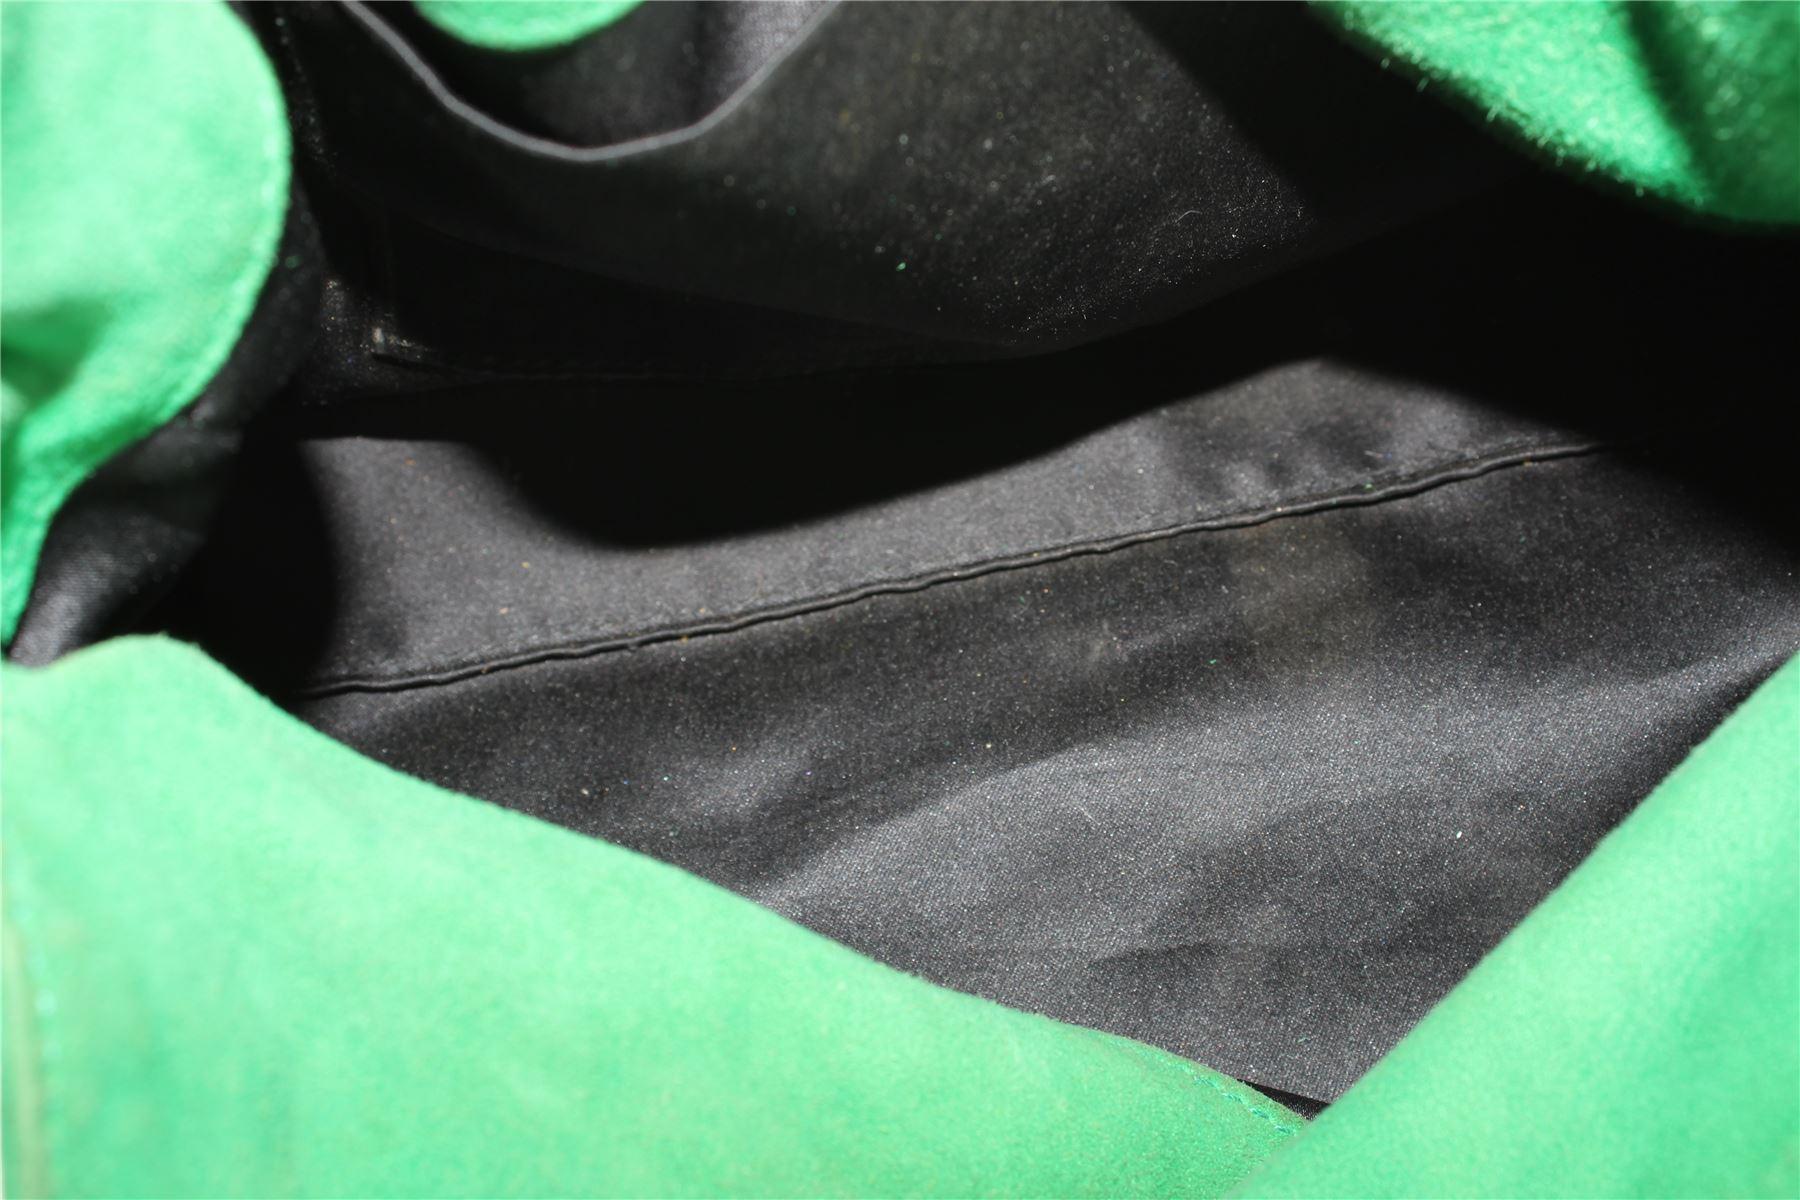 YVES SAINT LAURENT Borsa a tracolla verde Suede 82cf9938538